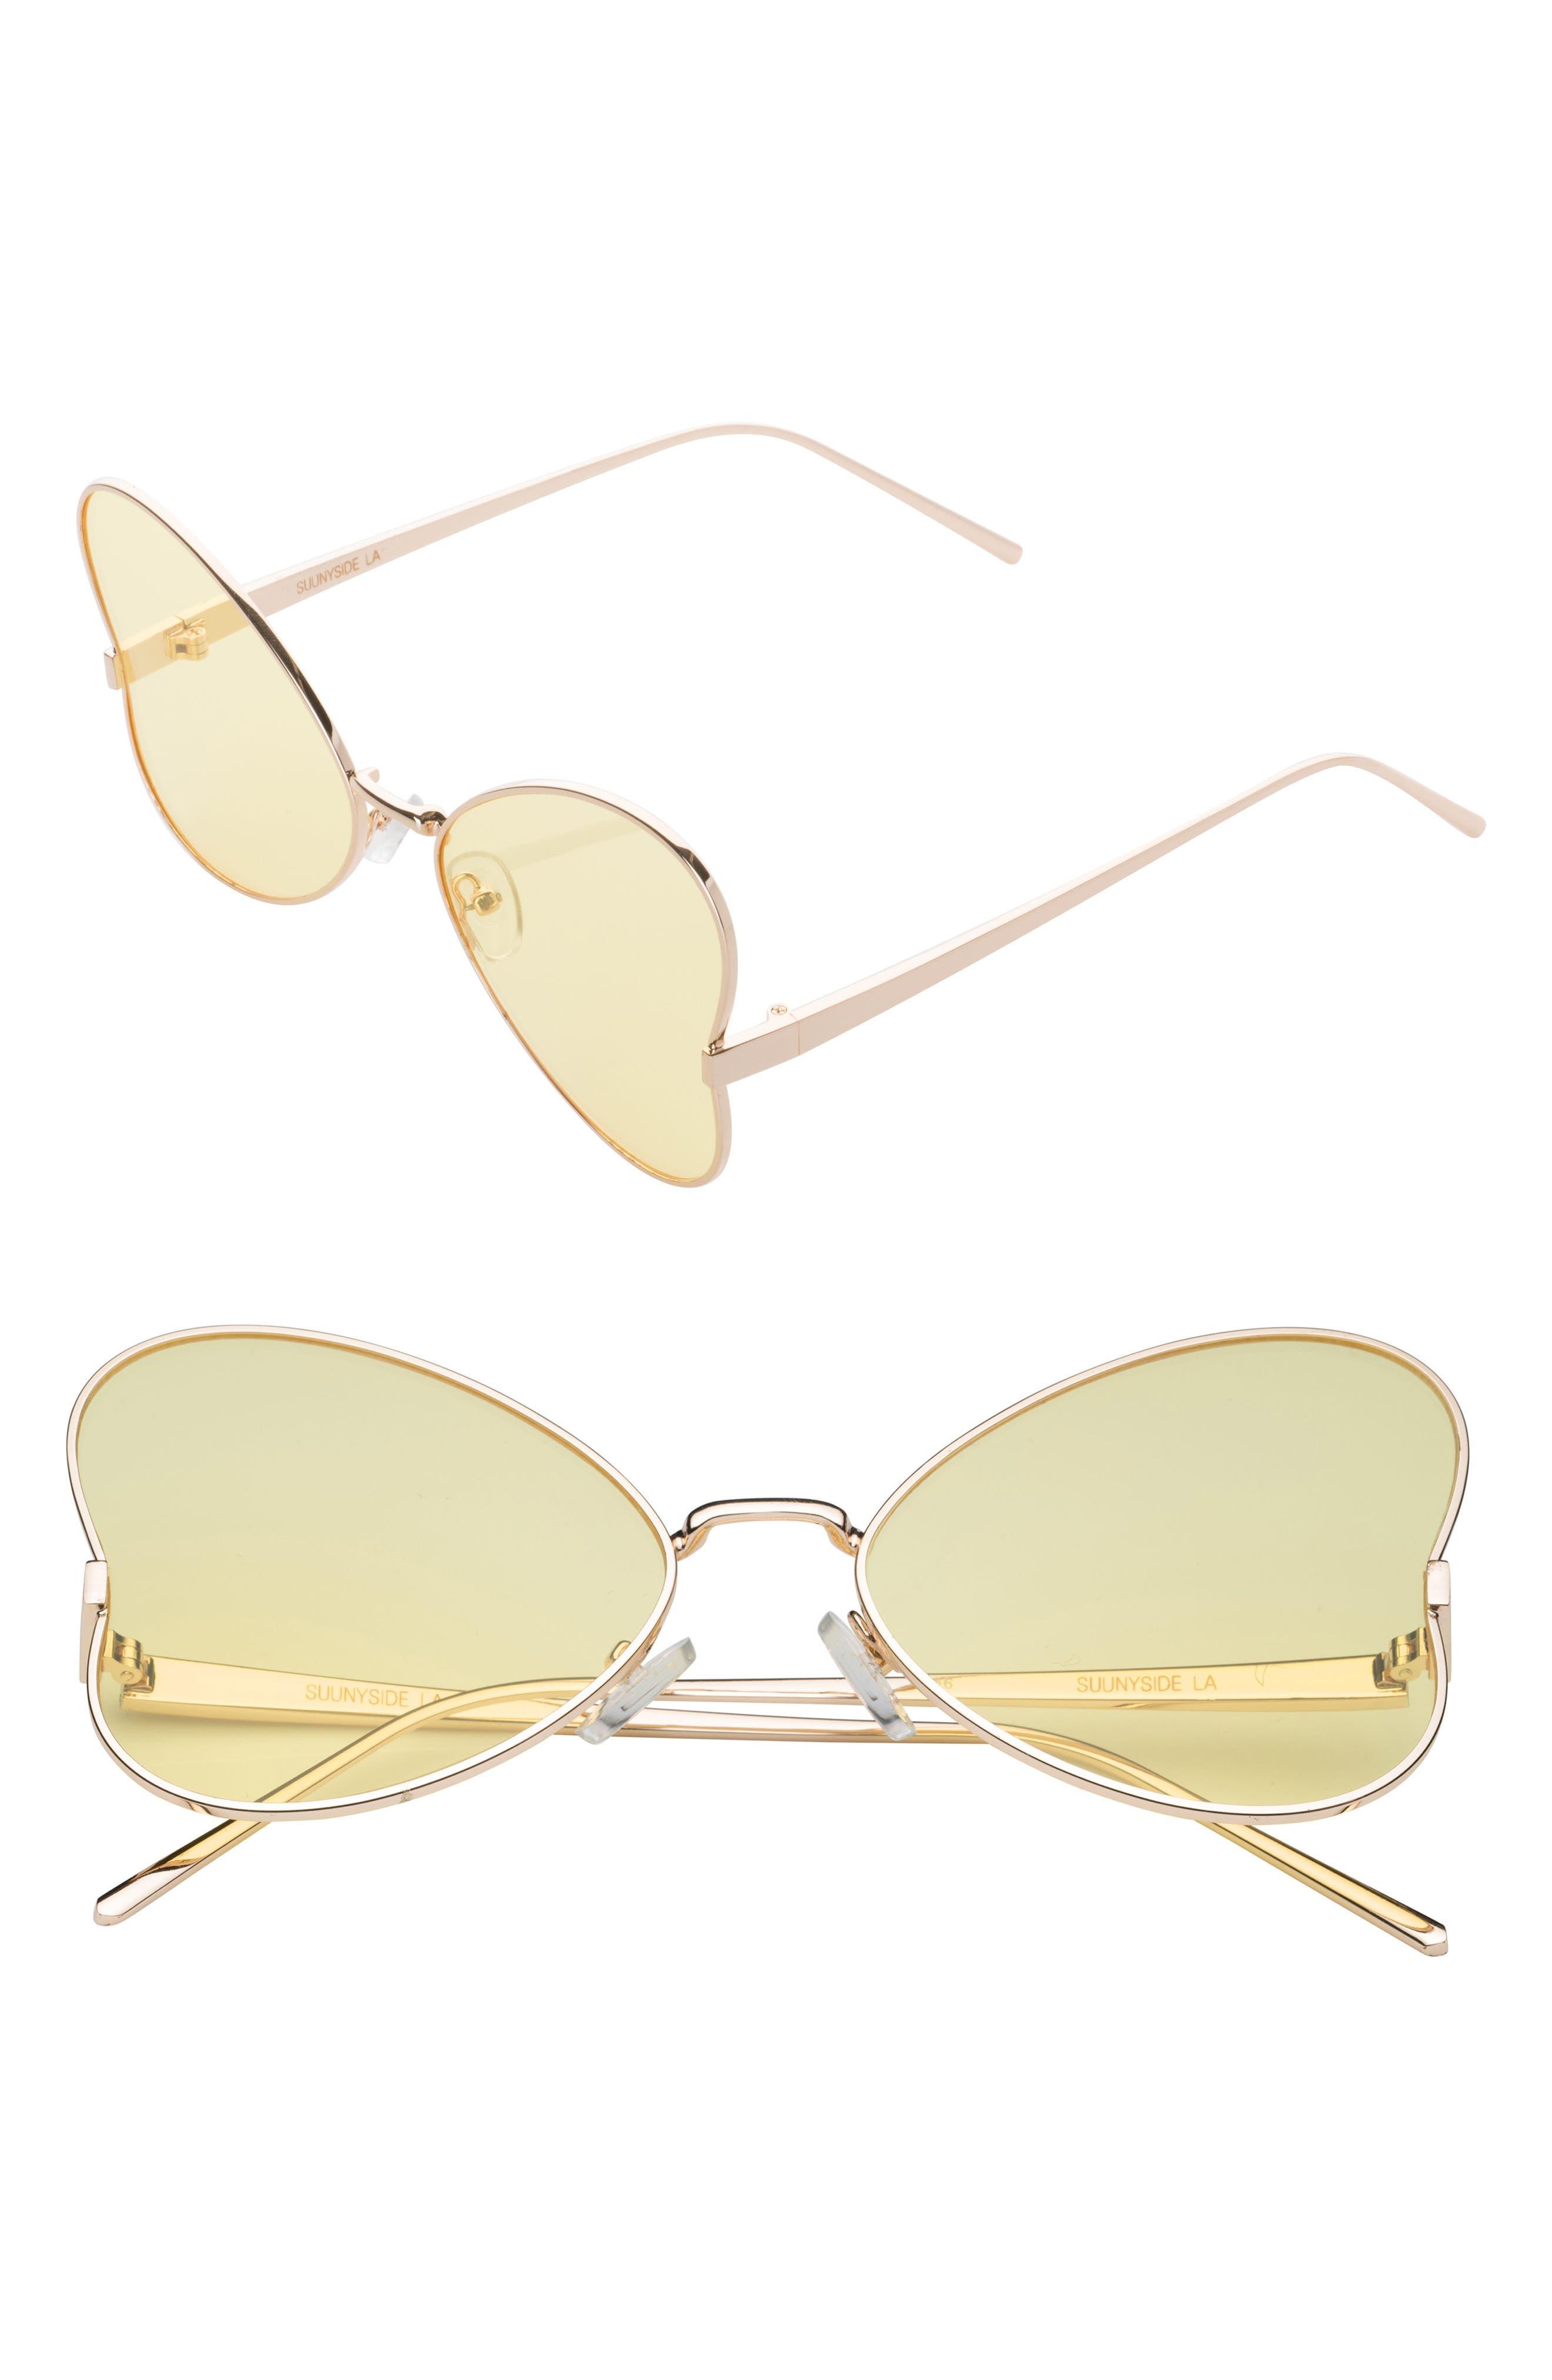 SunnySide LA 56mm Heart Sunglasses